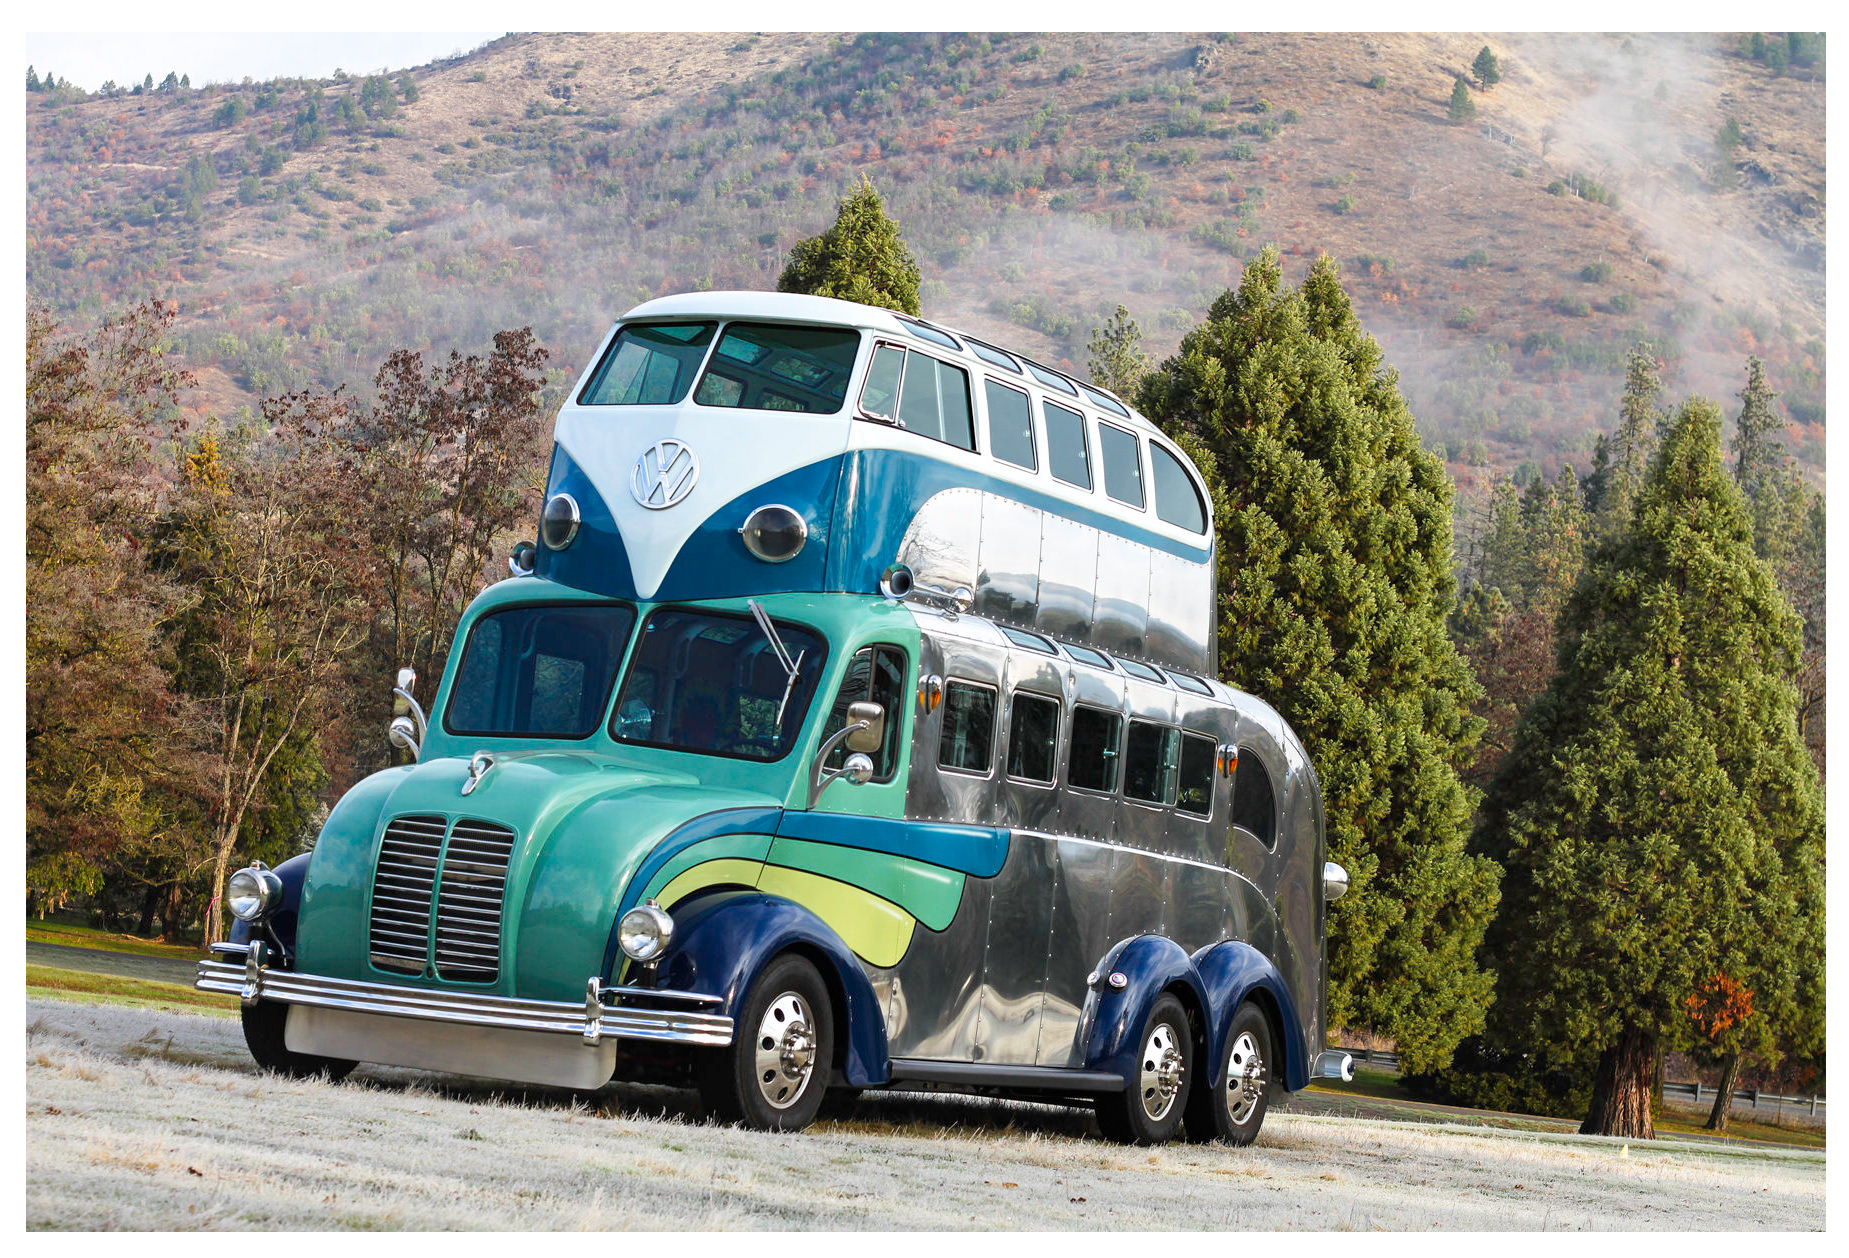 Randy Grubb Magic Bus on American Motorcycles